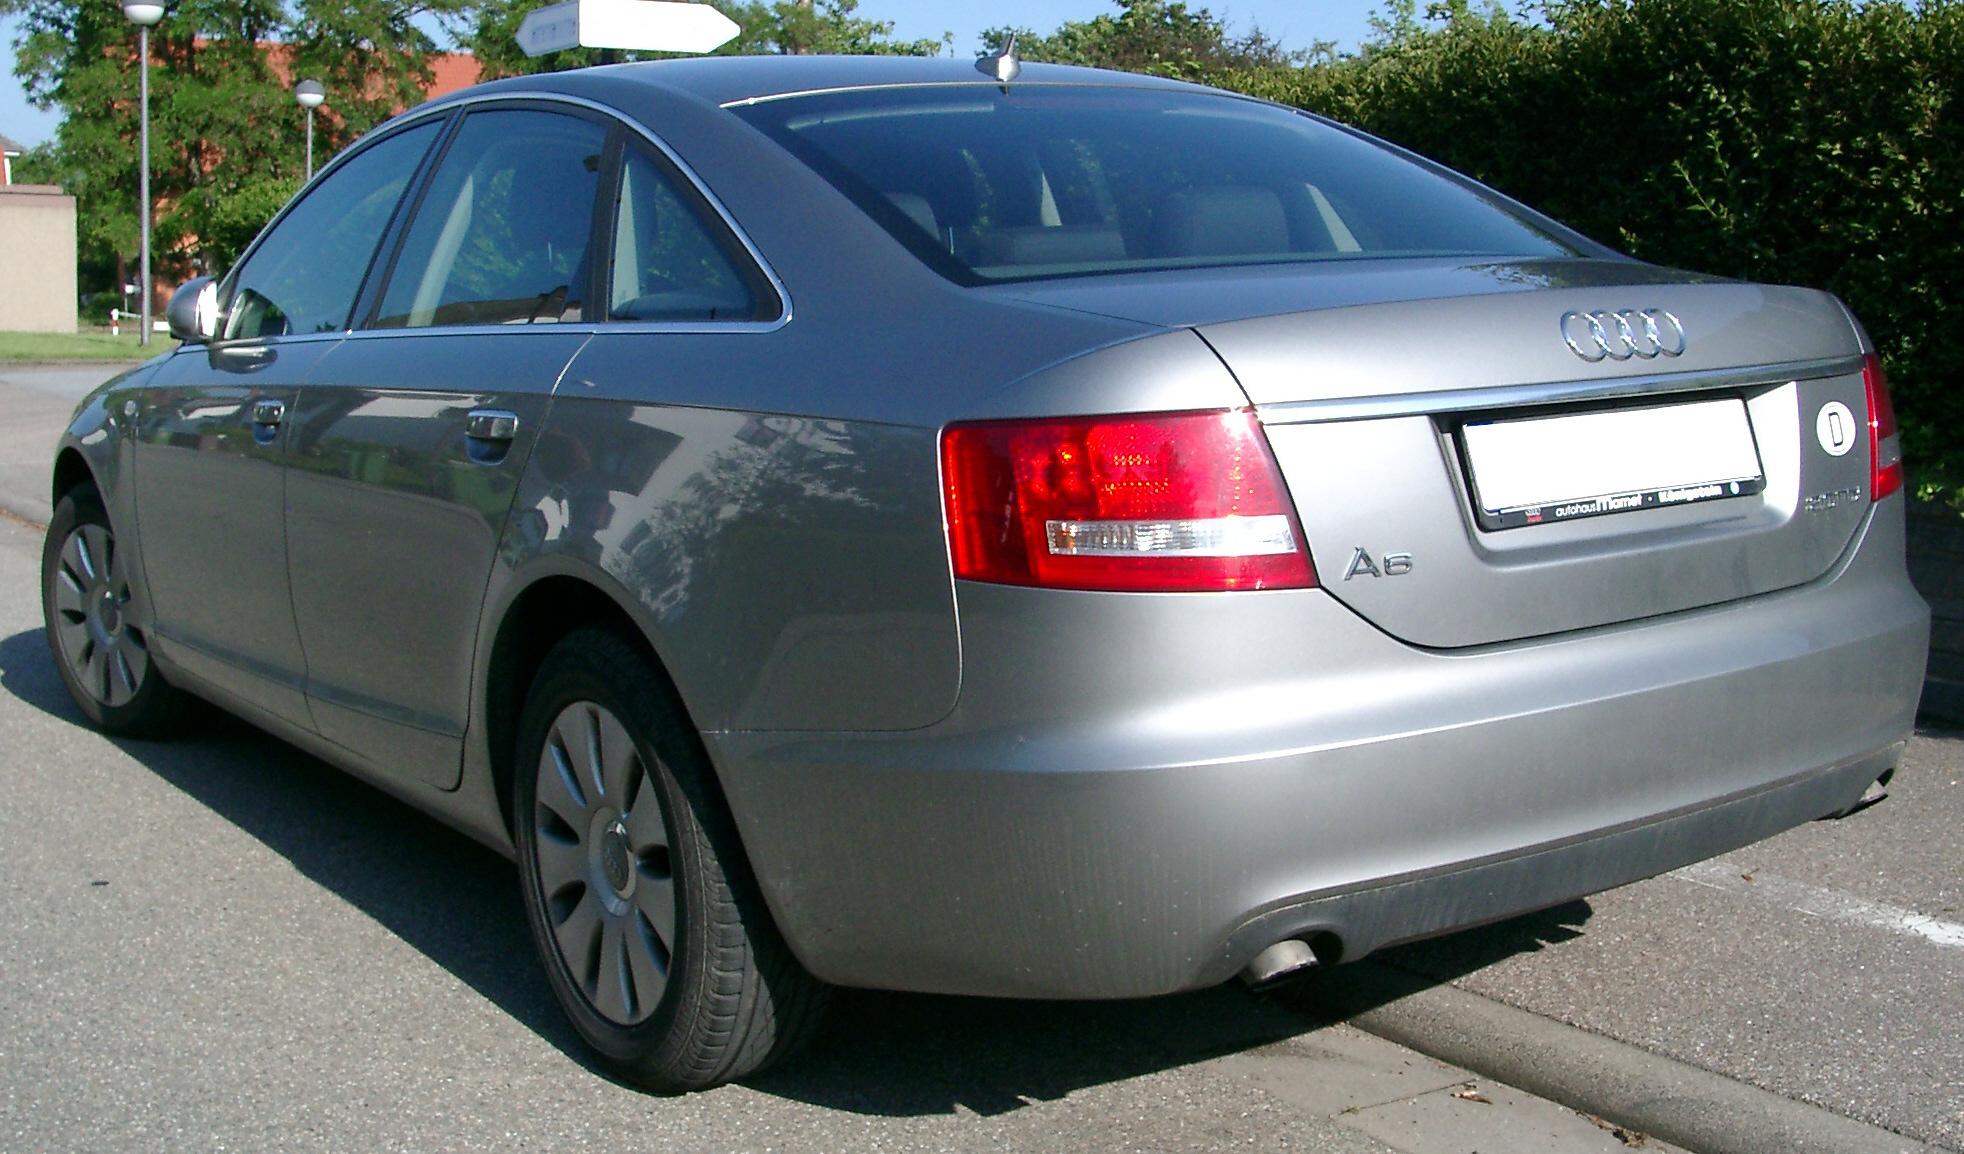 File Audi A6 C6 Rear 20070518 Jpg Wikimedia Commons